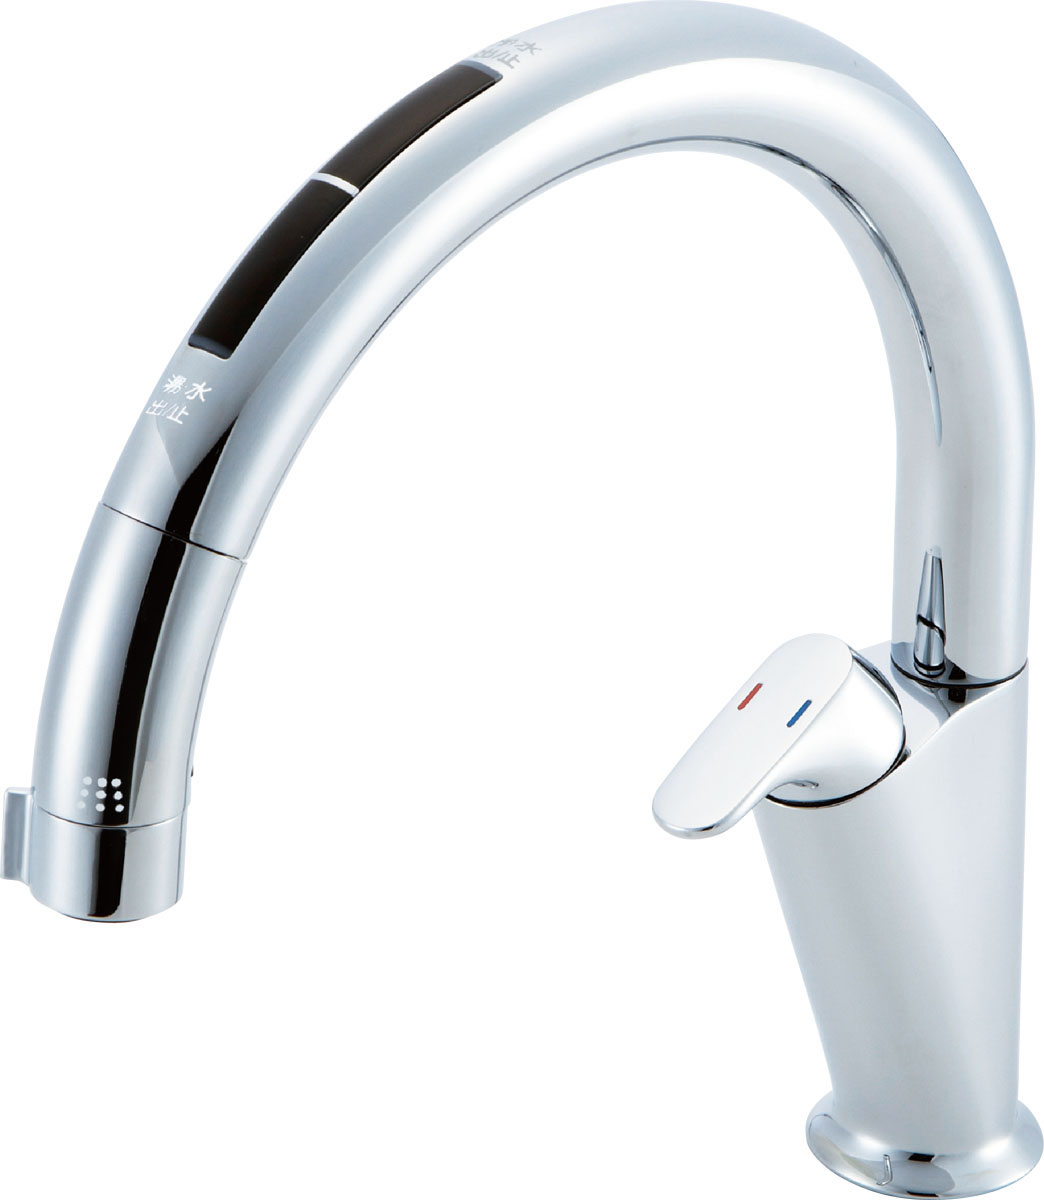 INAX LIXIL キッチン水栓 JF-NA466SU (JW) キッチン用タッチレス水栓 ナビッシュ (浄水器ビルトイン型) A6タイプ イナックス リクシル